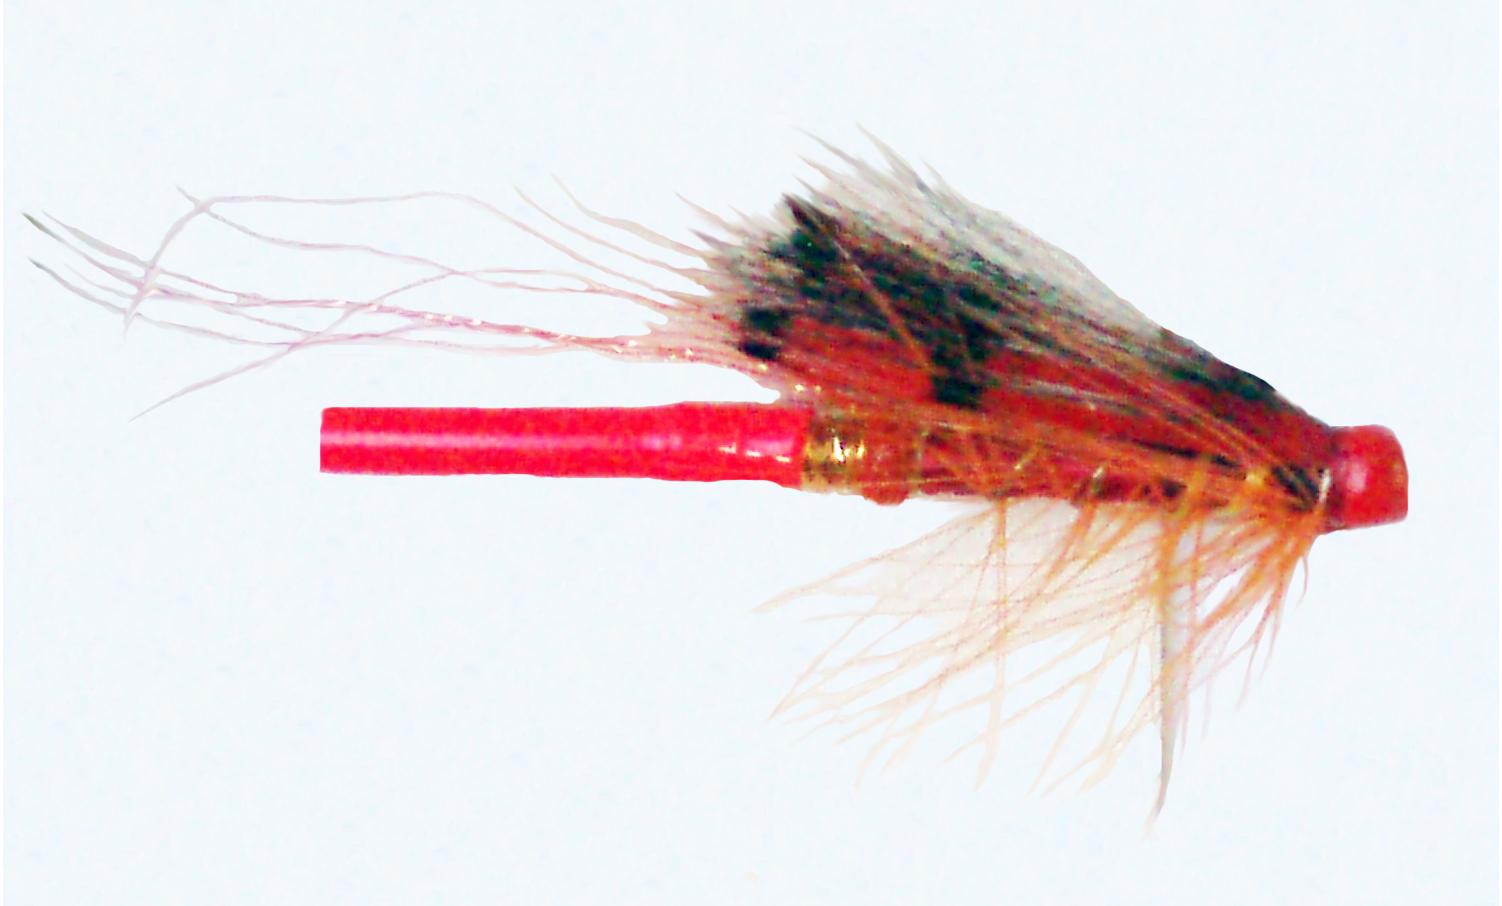 Мушки на трубках Рыбалка круглый год 47